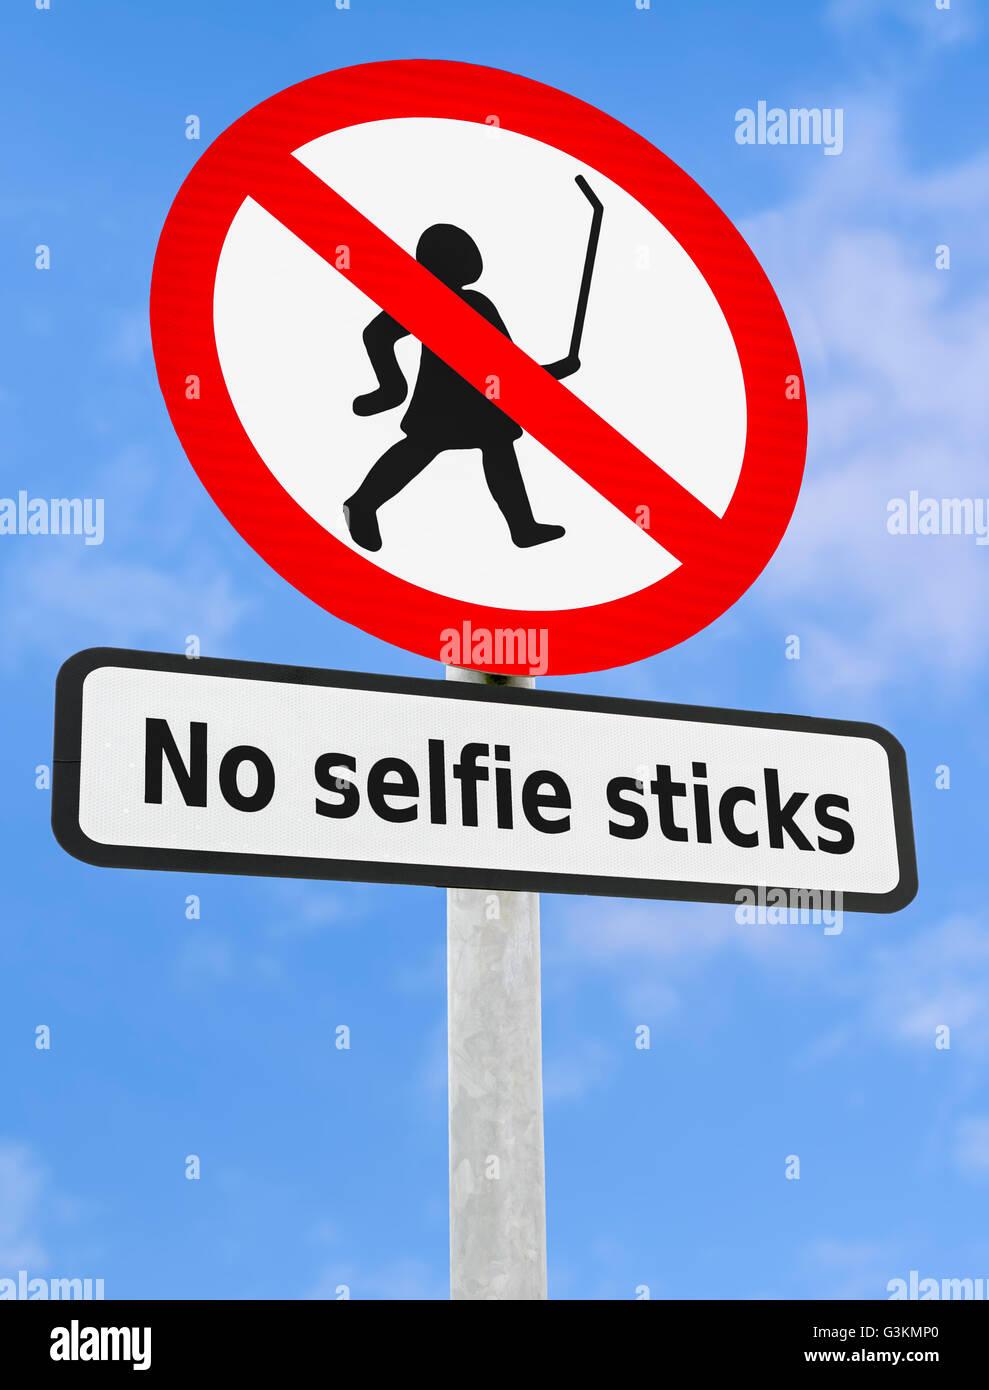 No selfie sticks sign. - Stock Image